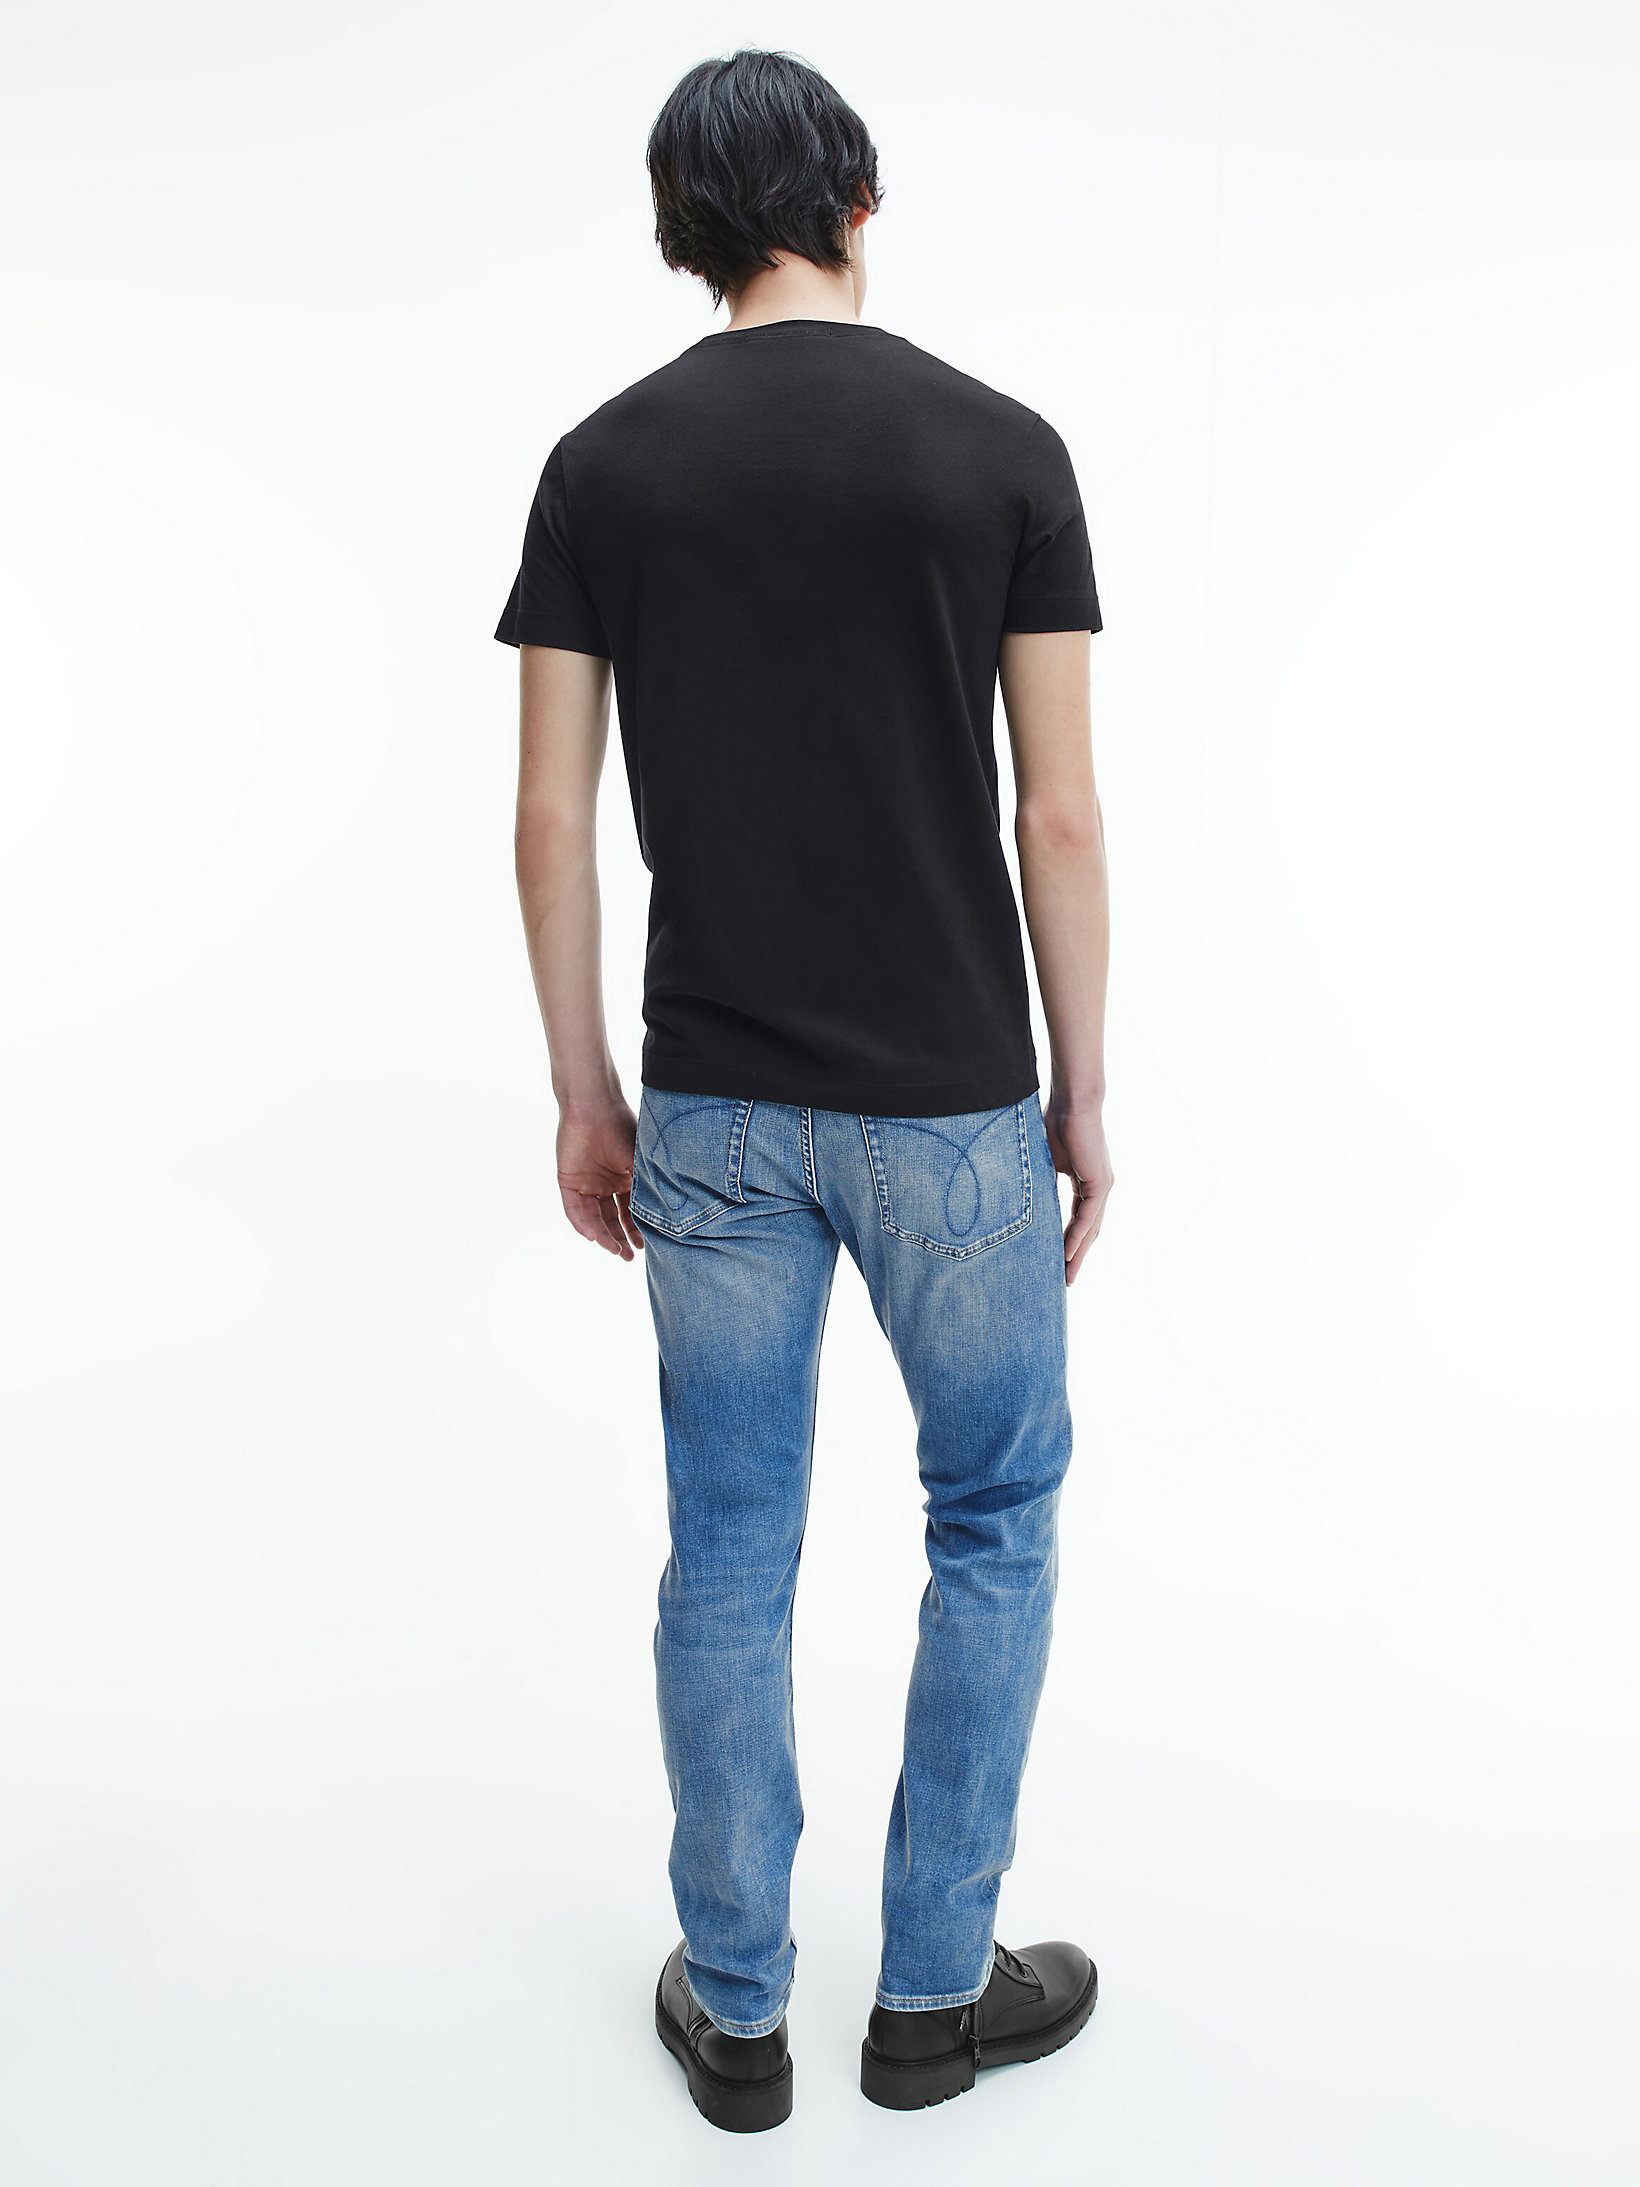 Calvin Klein Micro Branding T-shirt Black